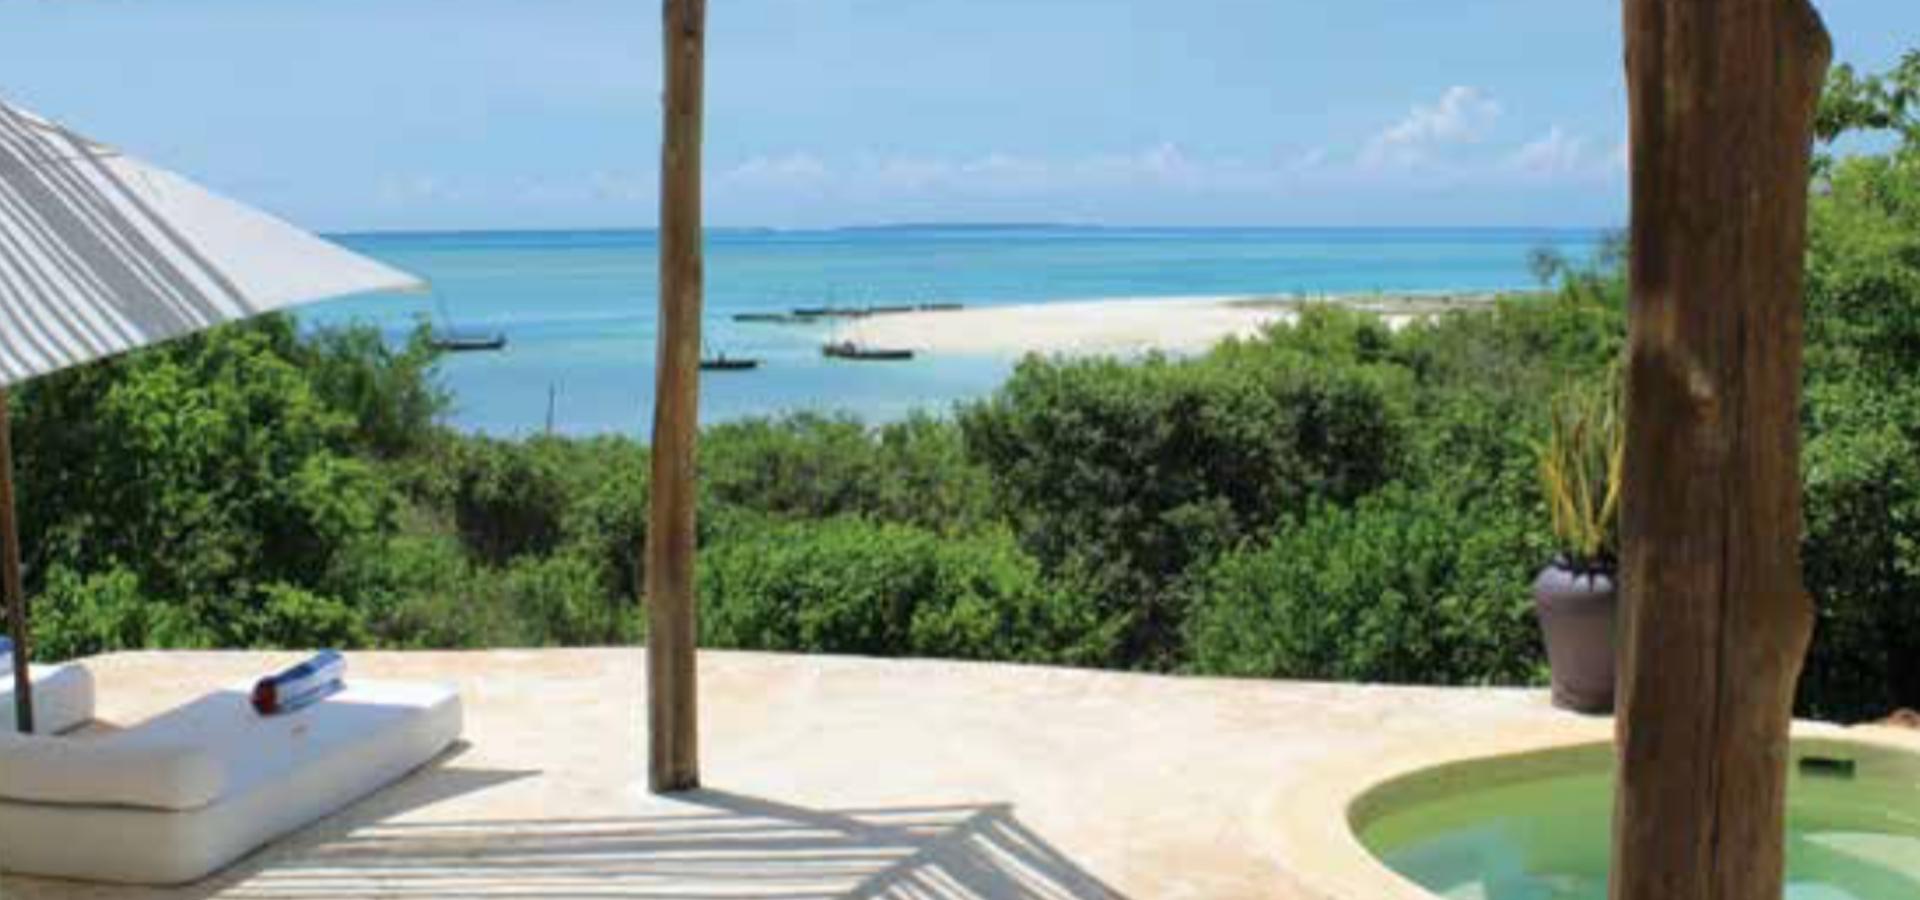 Sansibar Reisen & Urlaub